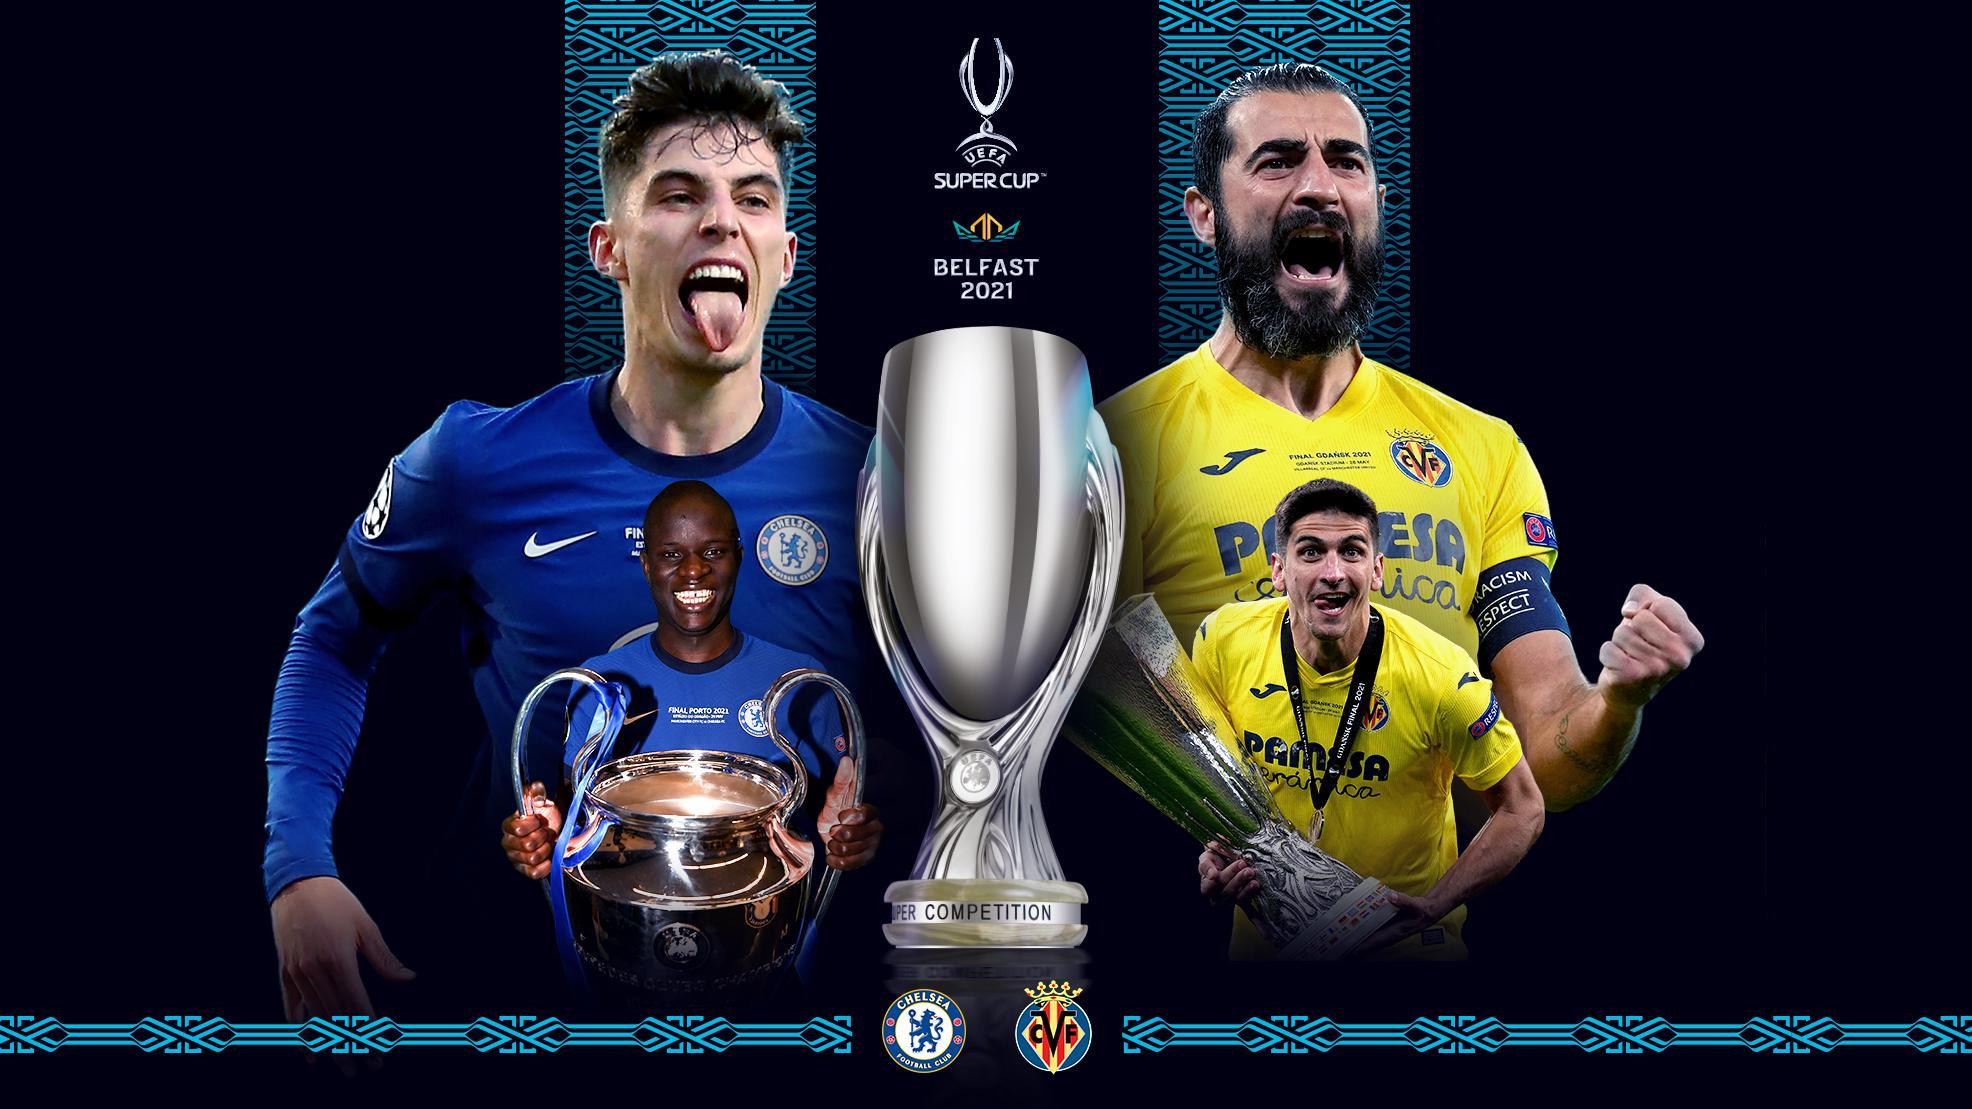 UEFA Super Cup: Chelsea vs Villarreal Live Stream, Preview and Prediction » FirstSportz